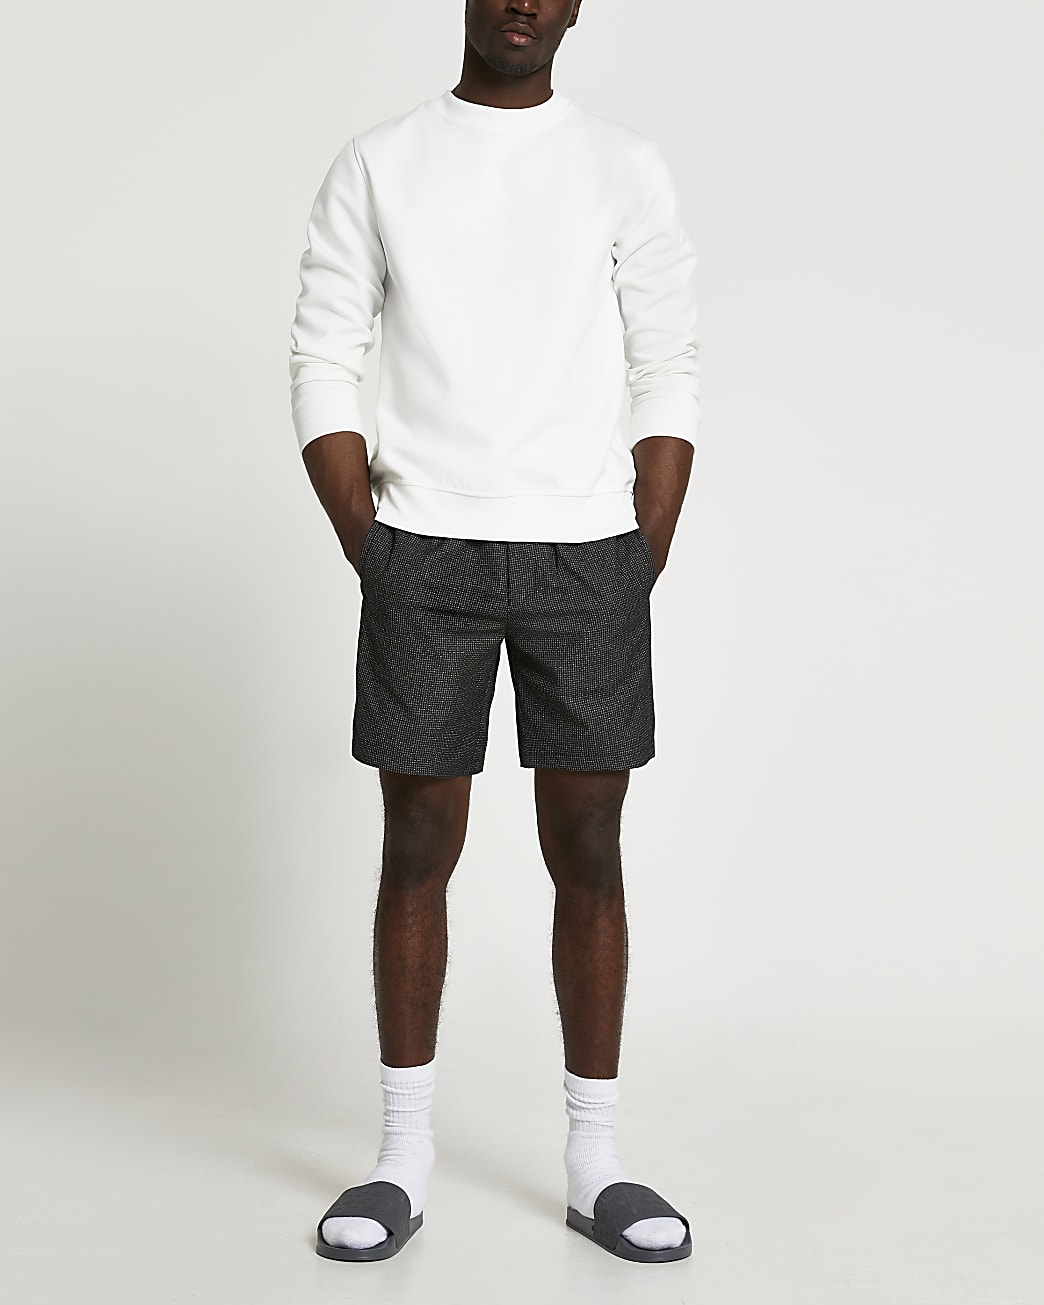 Black textured elasticated shorts